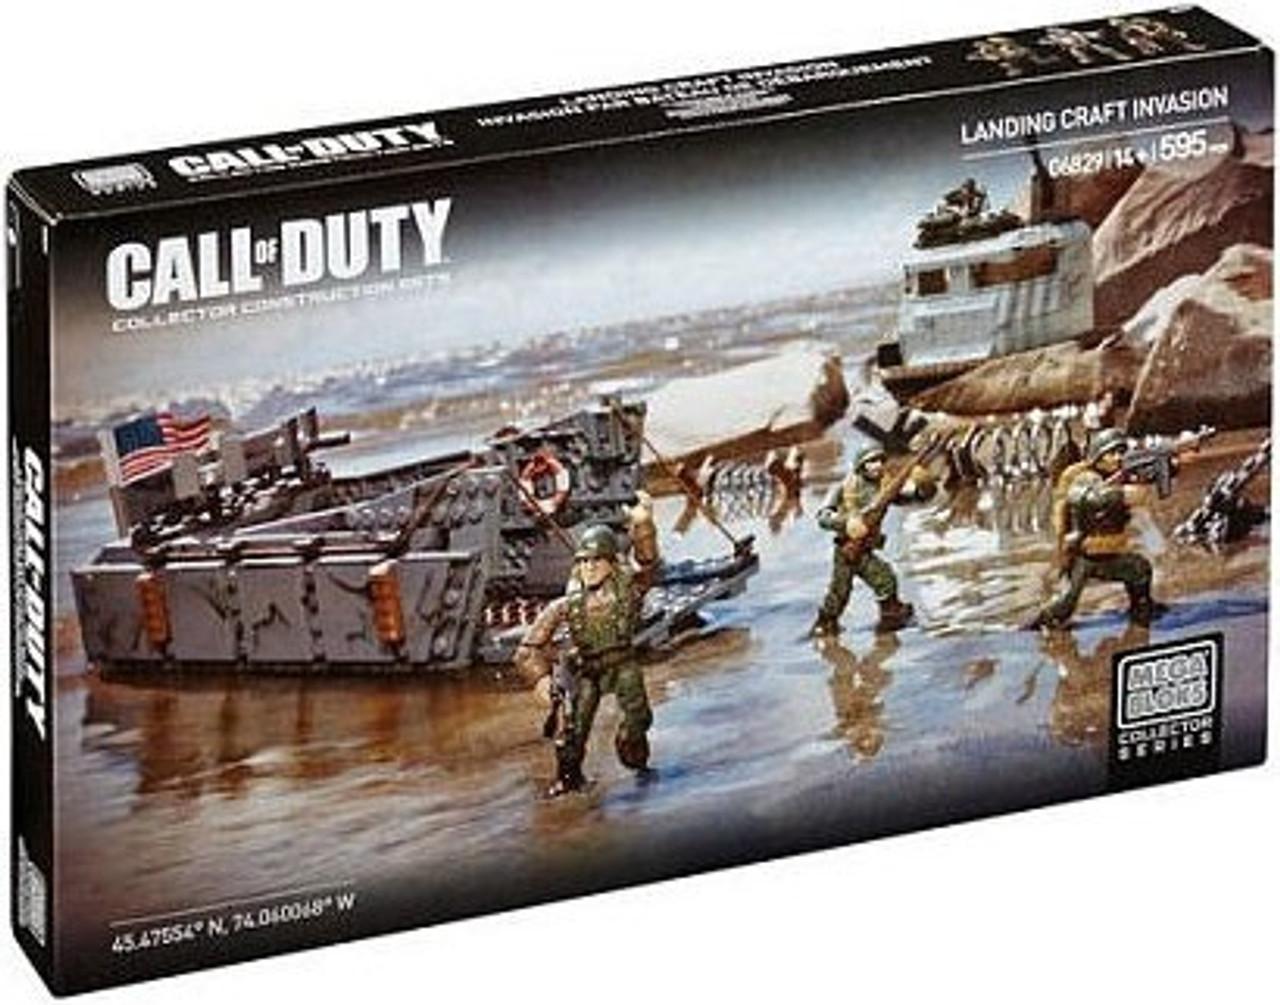 Mega Bloks Call of Duty Landing Craft Invasion Set #06829